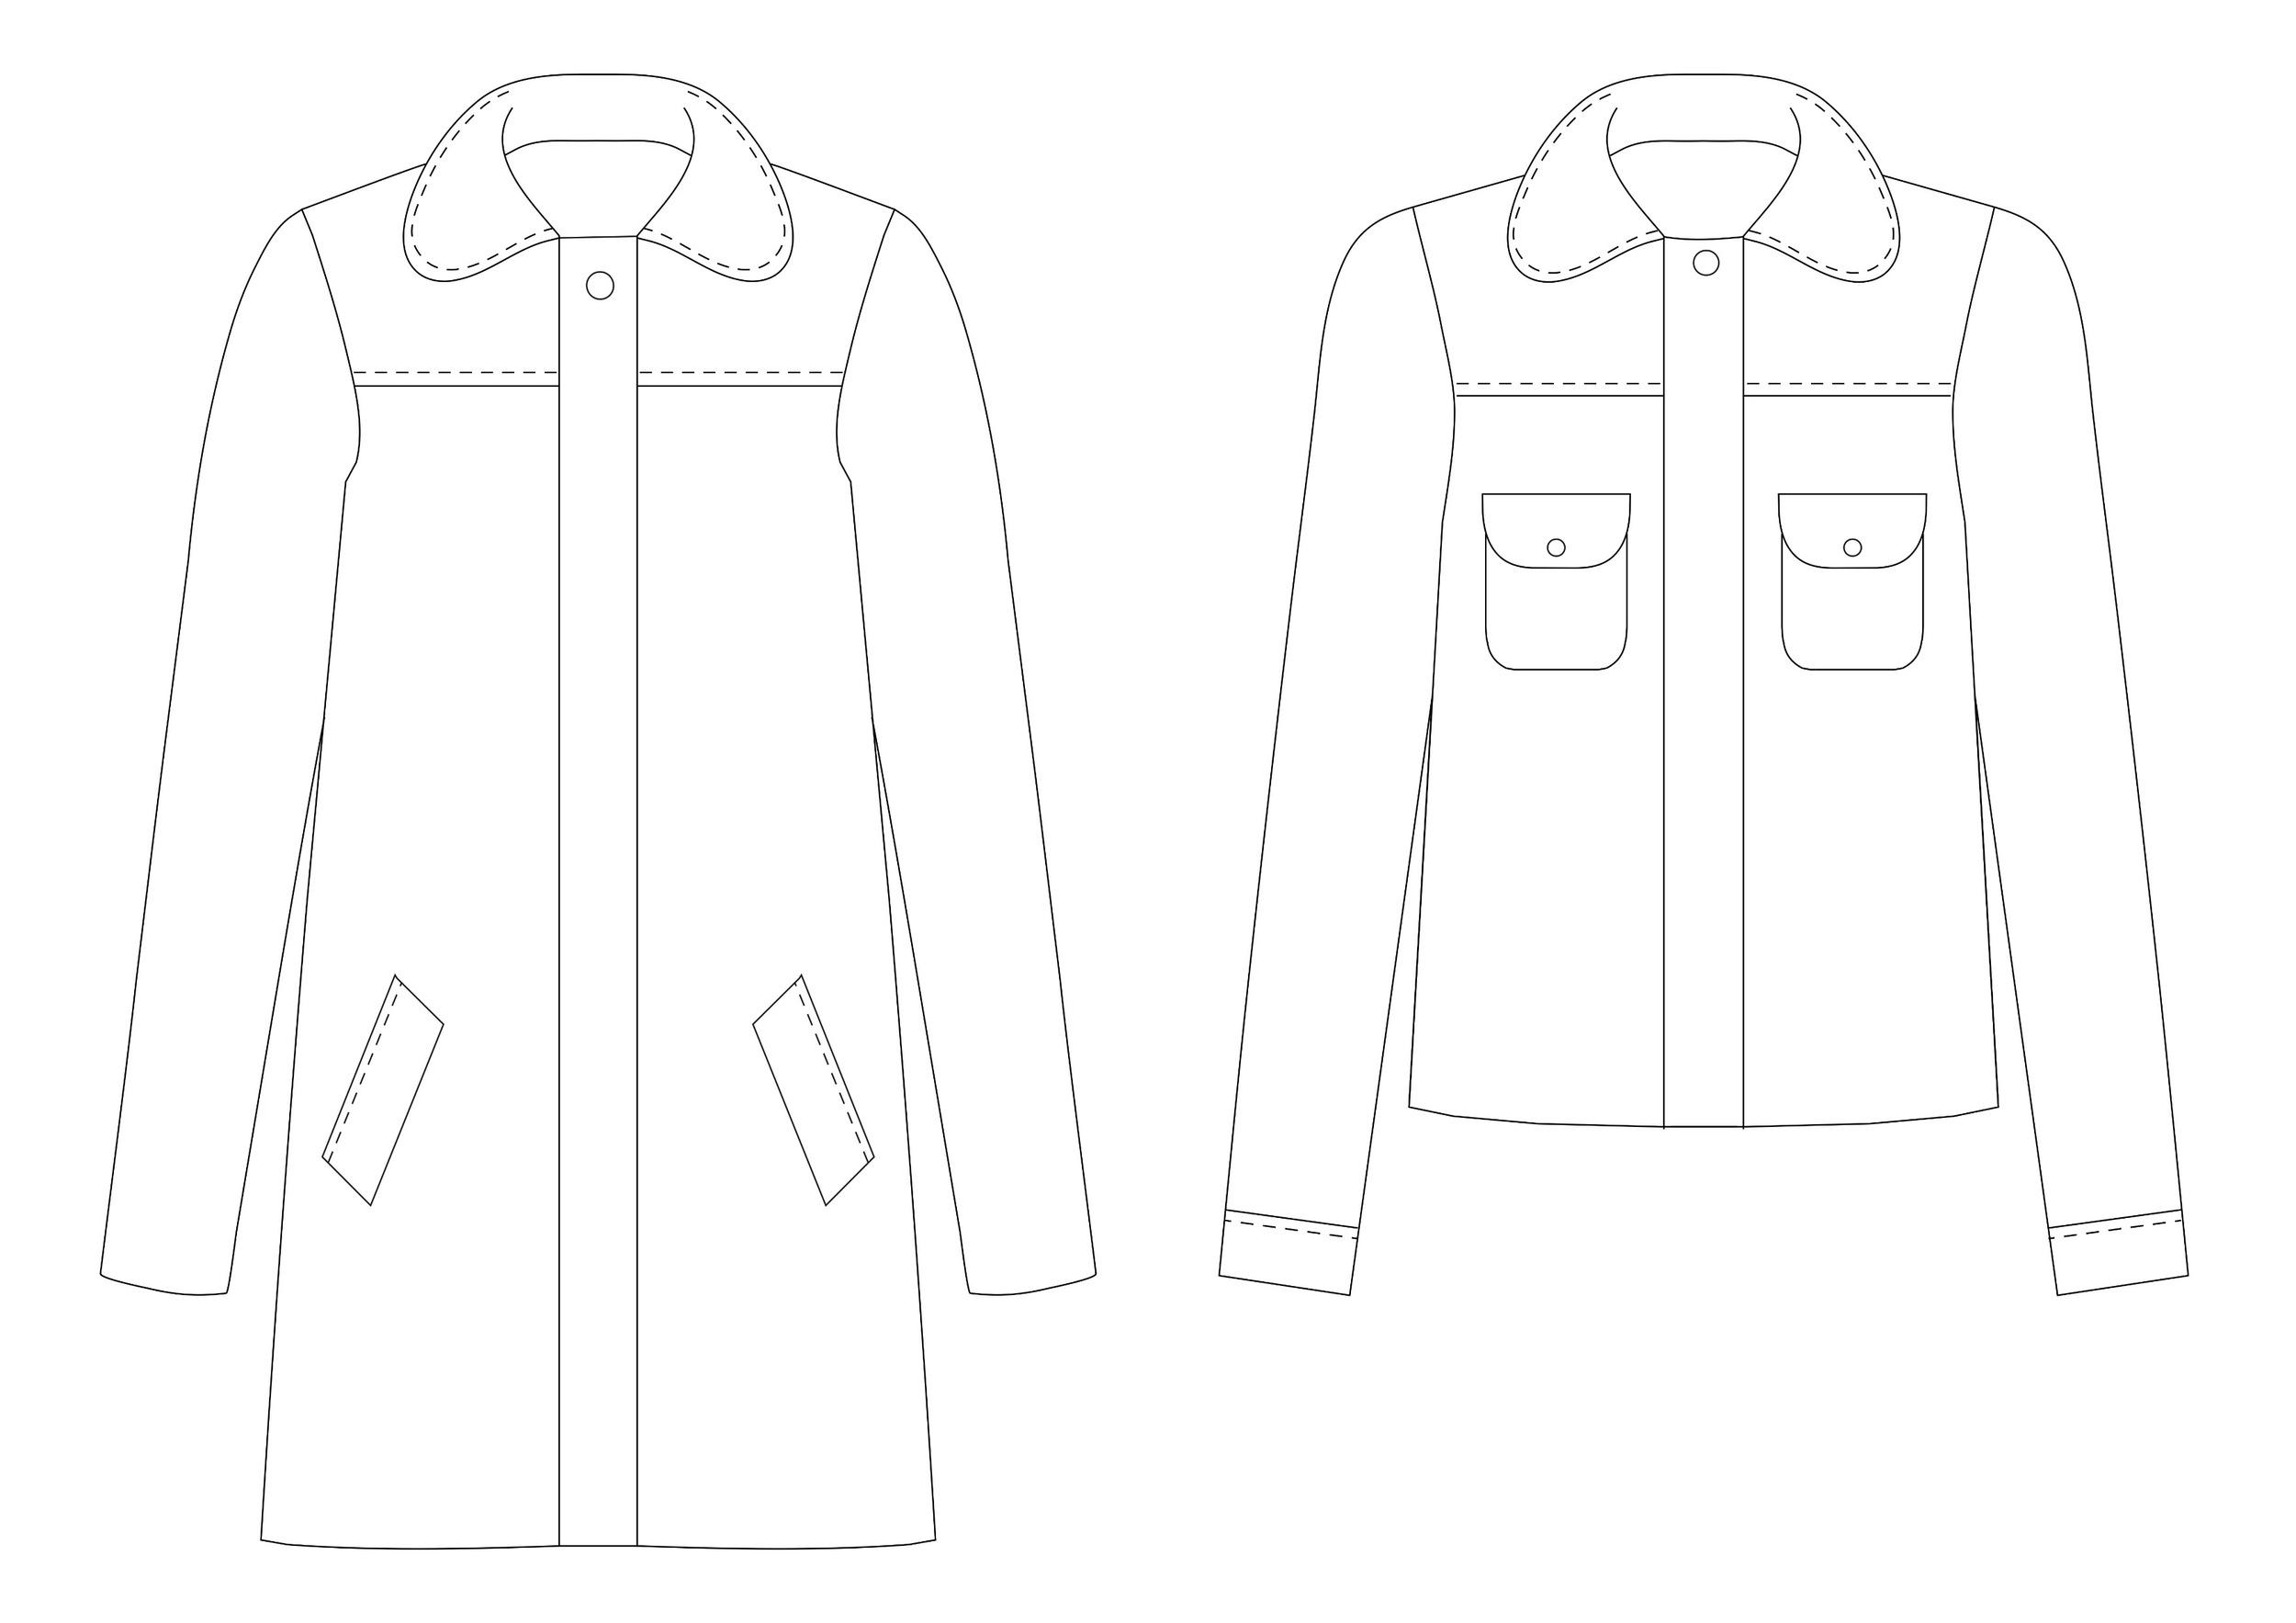 Cascade duffle coat 2 style variations.jpg